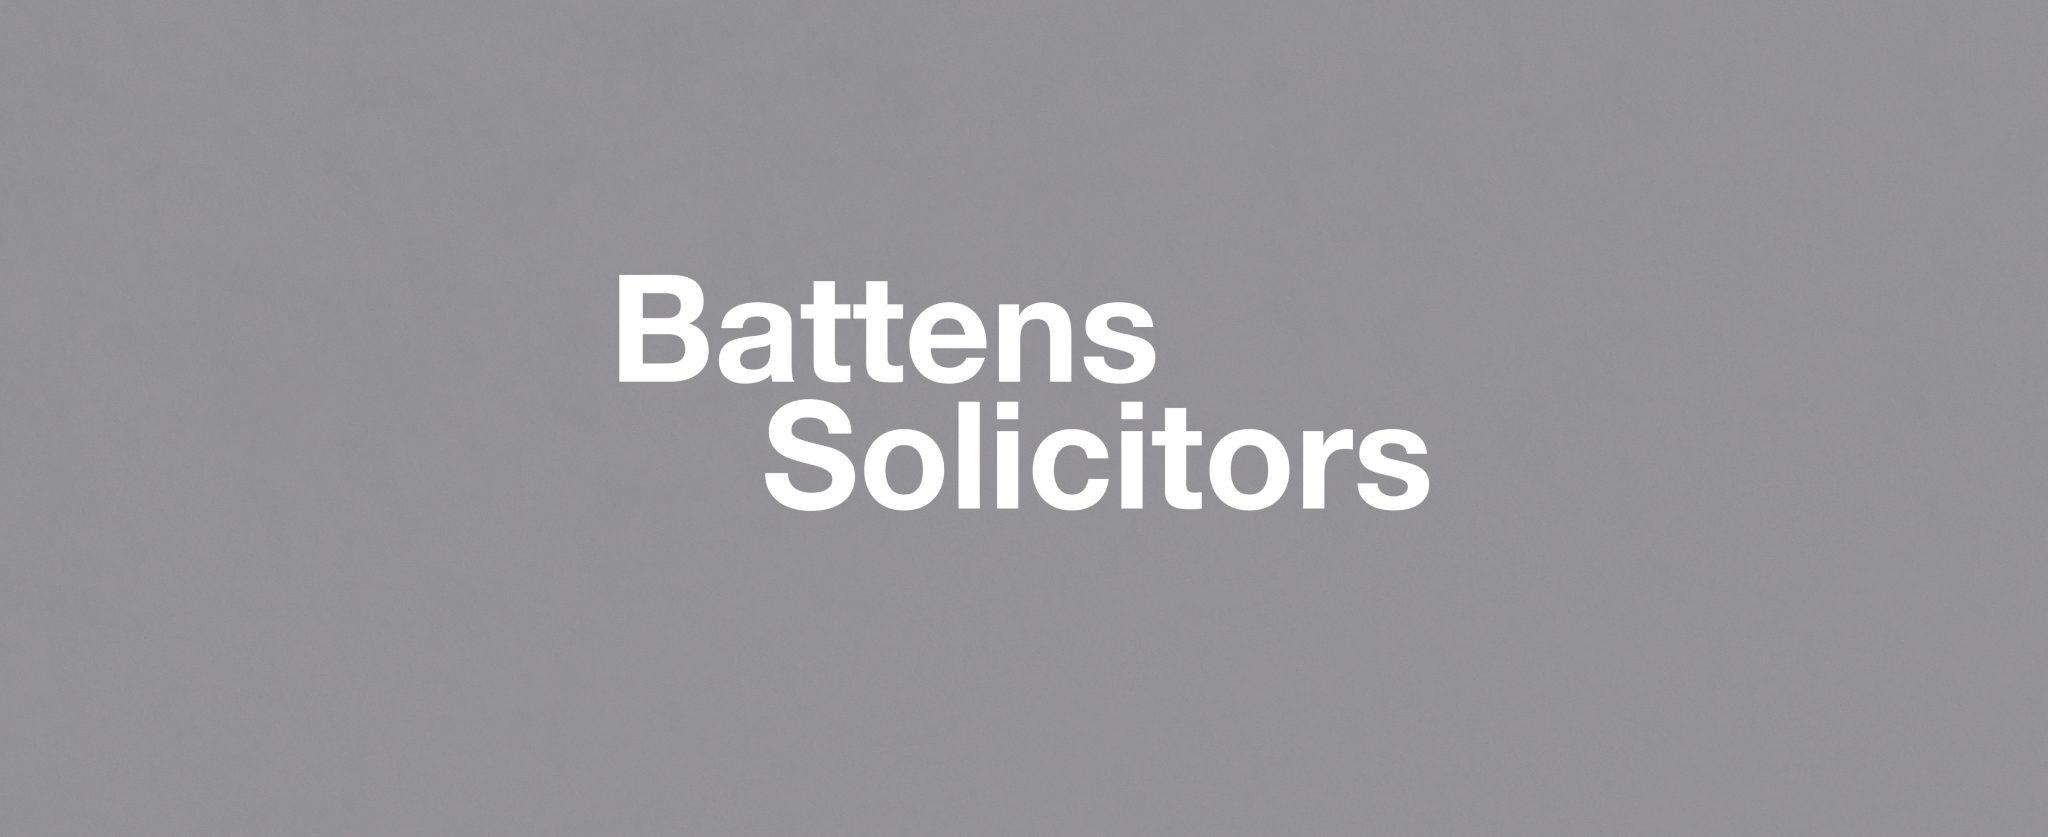 battens-logo